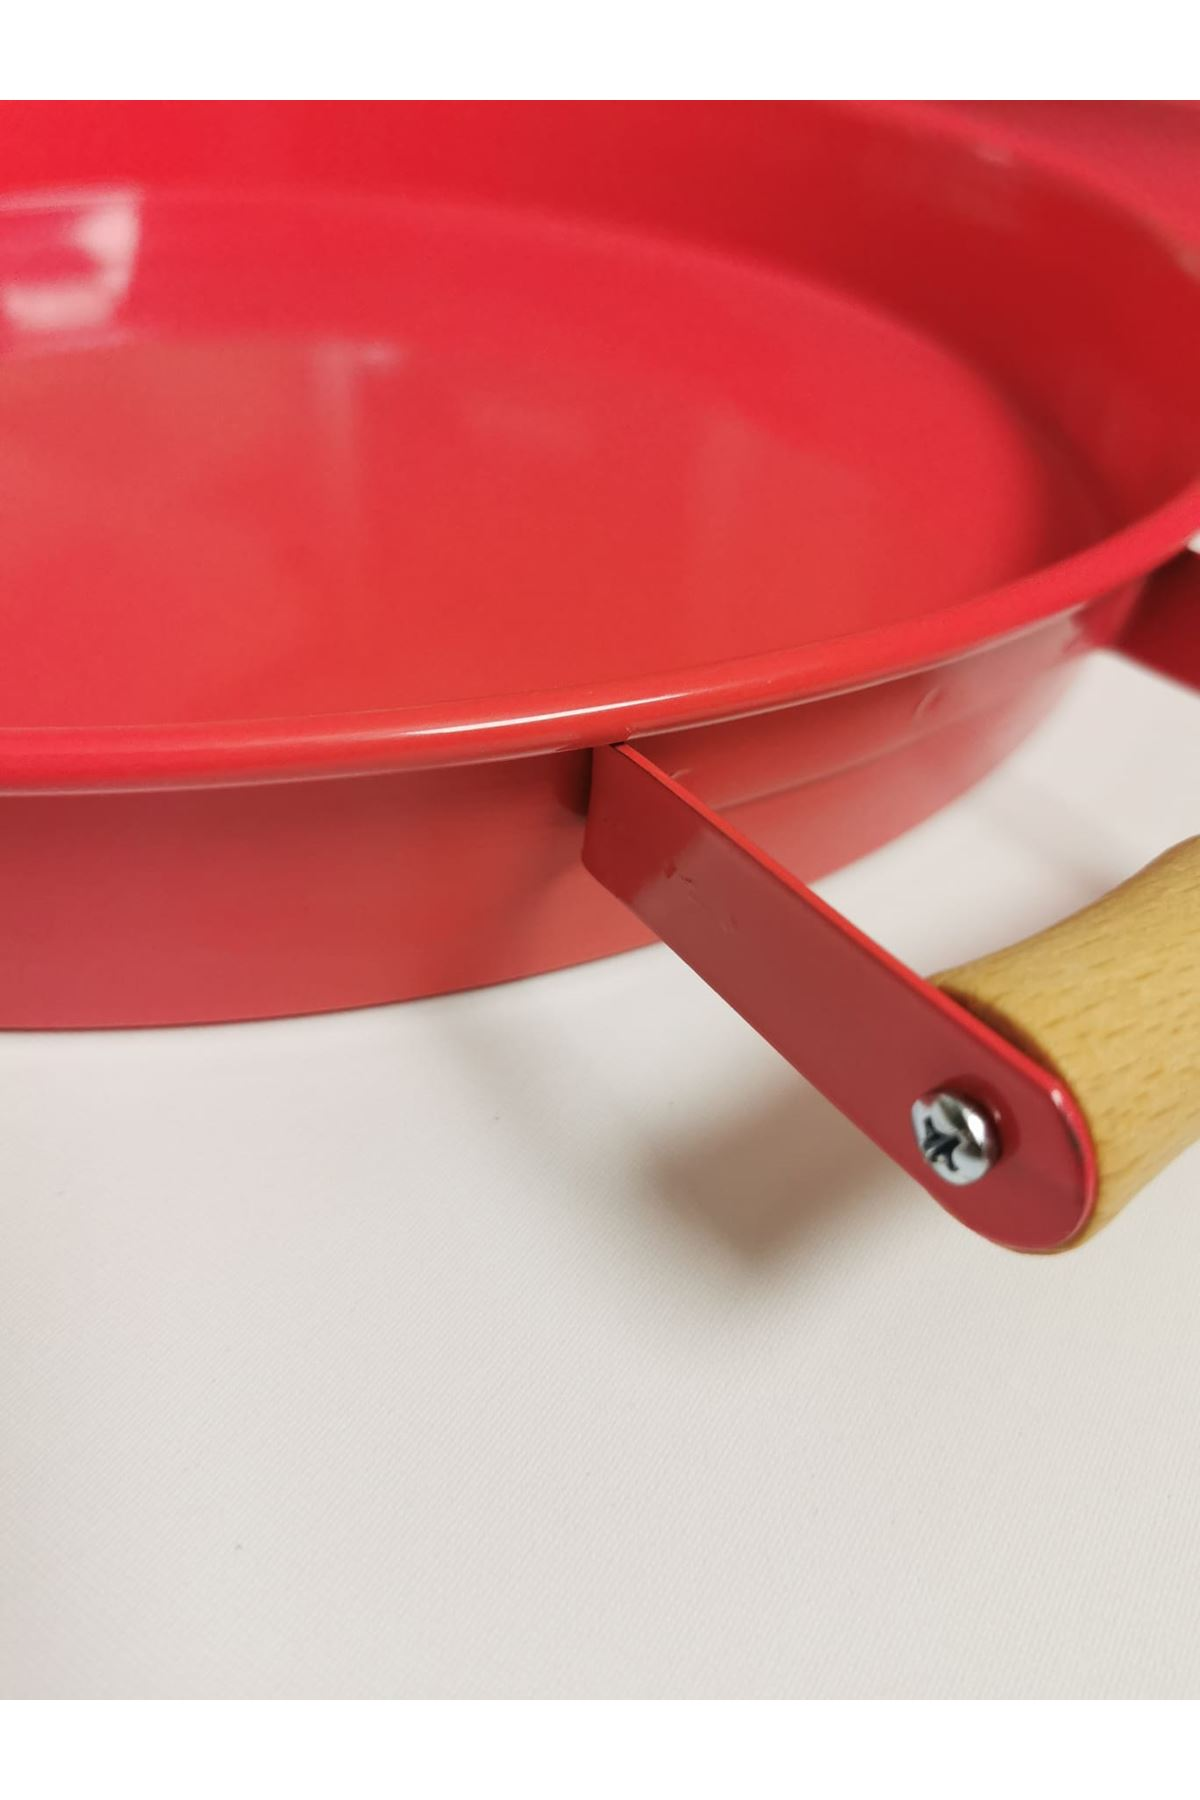 Kitchen Trend 2 Li 51 Cm ve 37 Cm  Ahşap Kulplu Metal Yuvarlak Pembe Tepsi Sunum Tepsi, Kahvaltı Tepsi